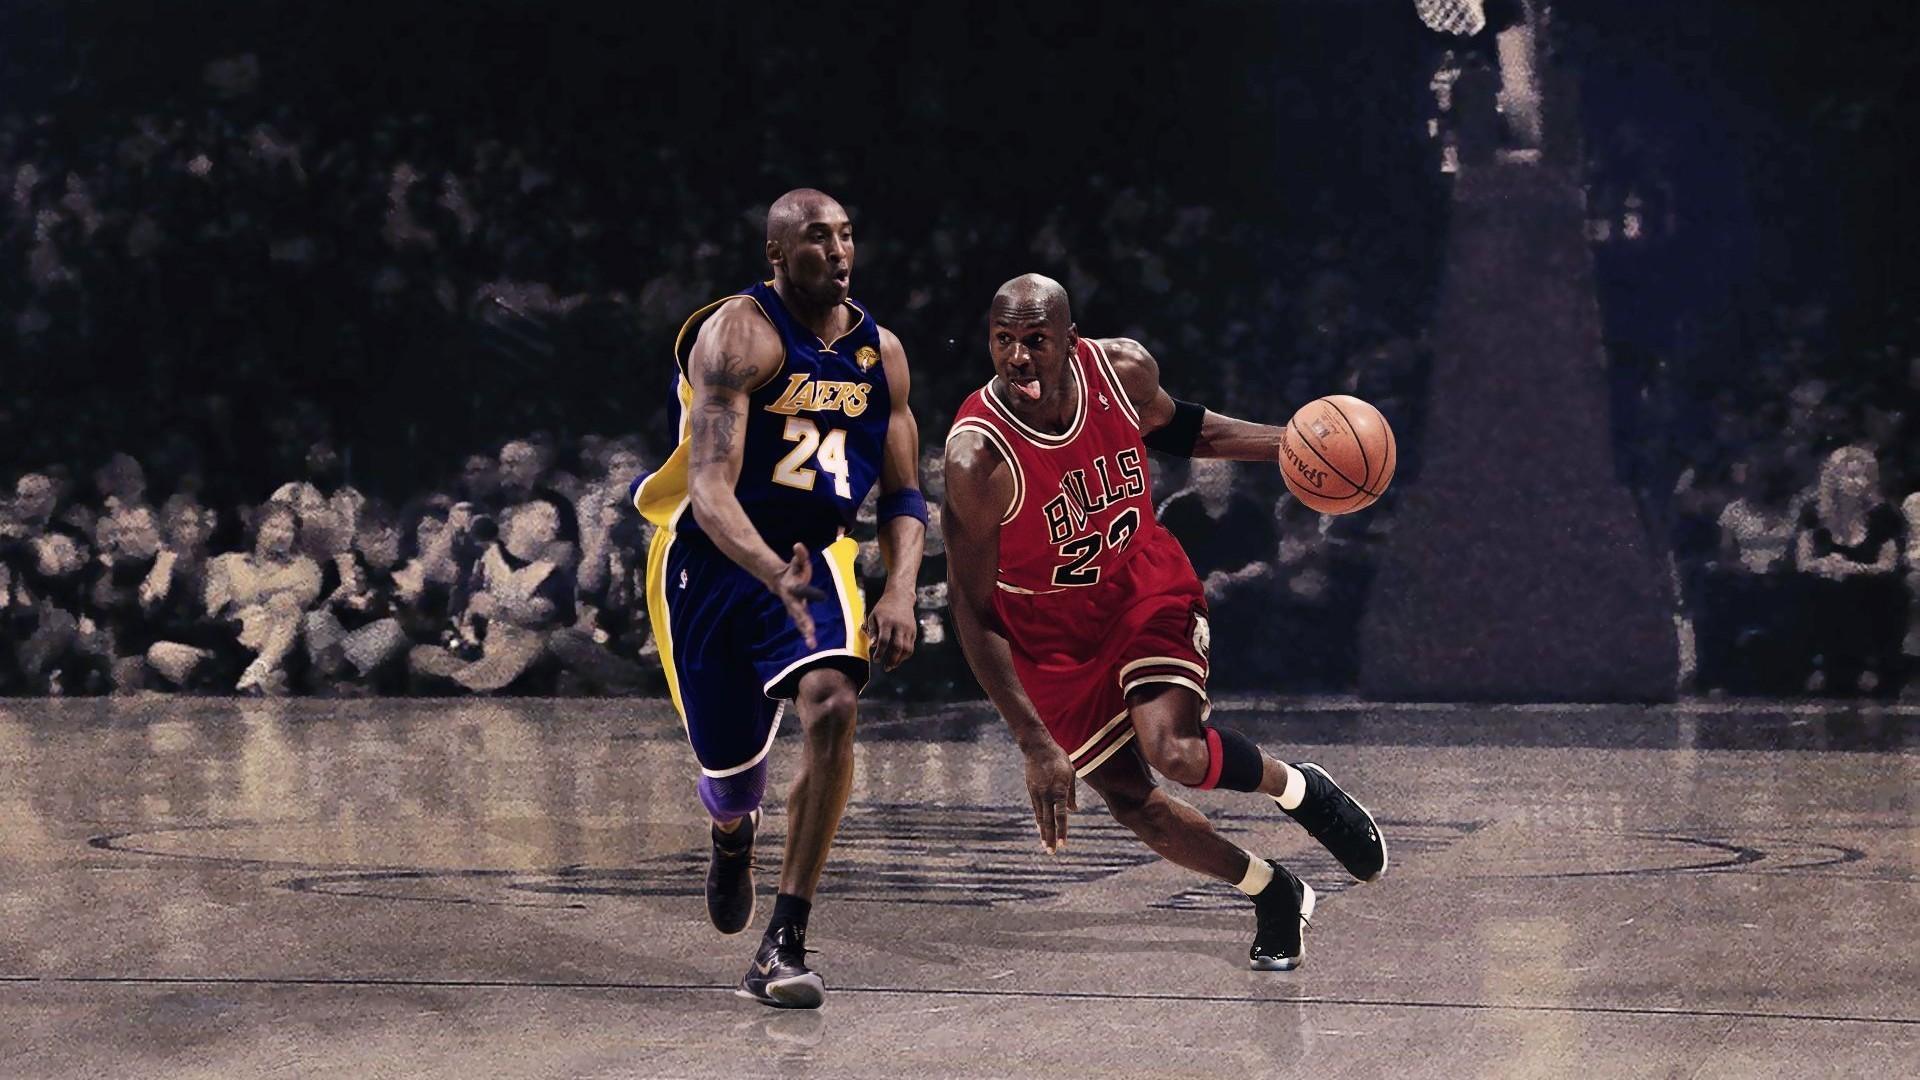 Nike Wallpaper Basketball 59 Images